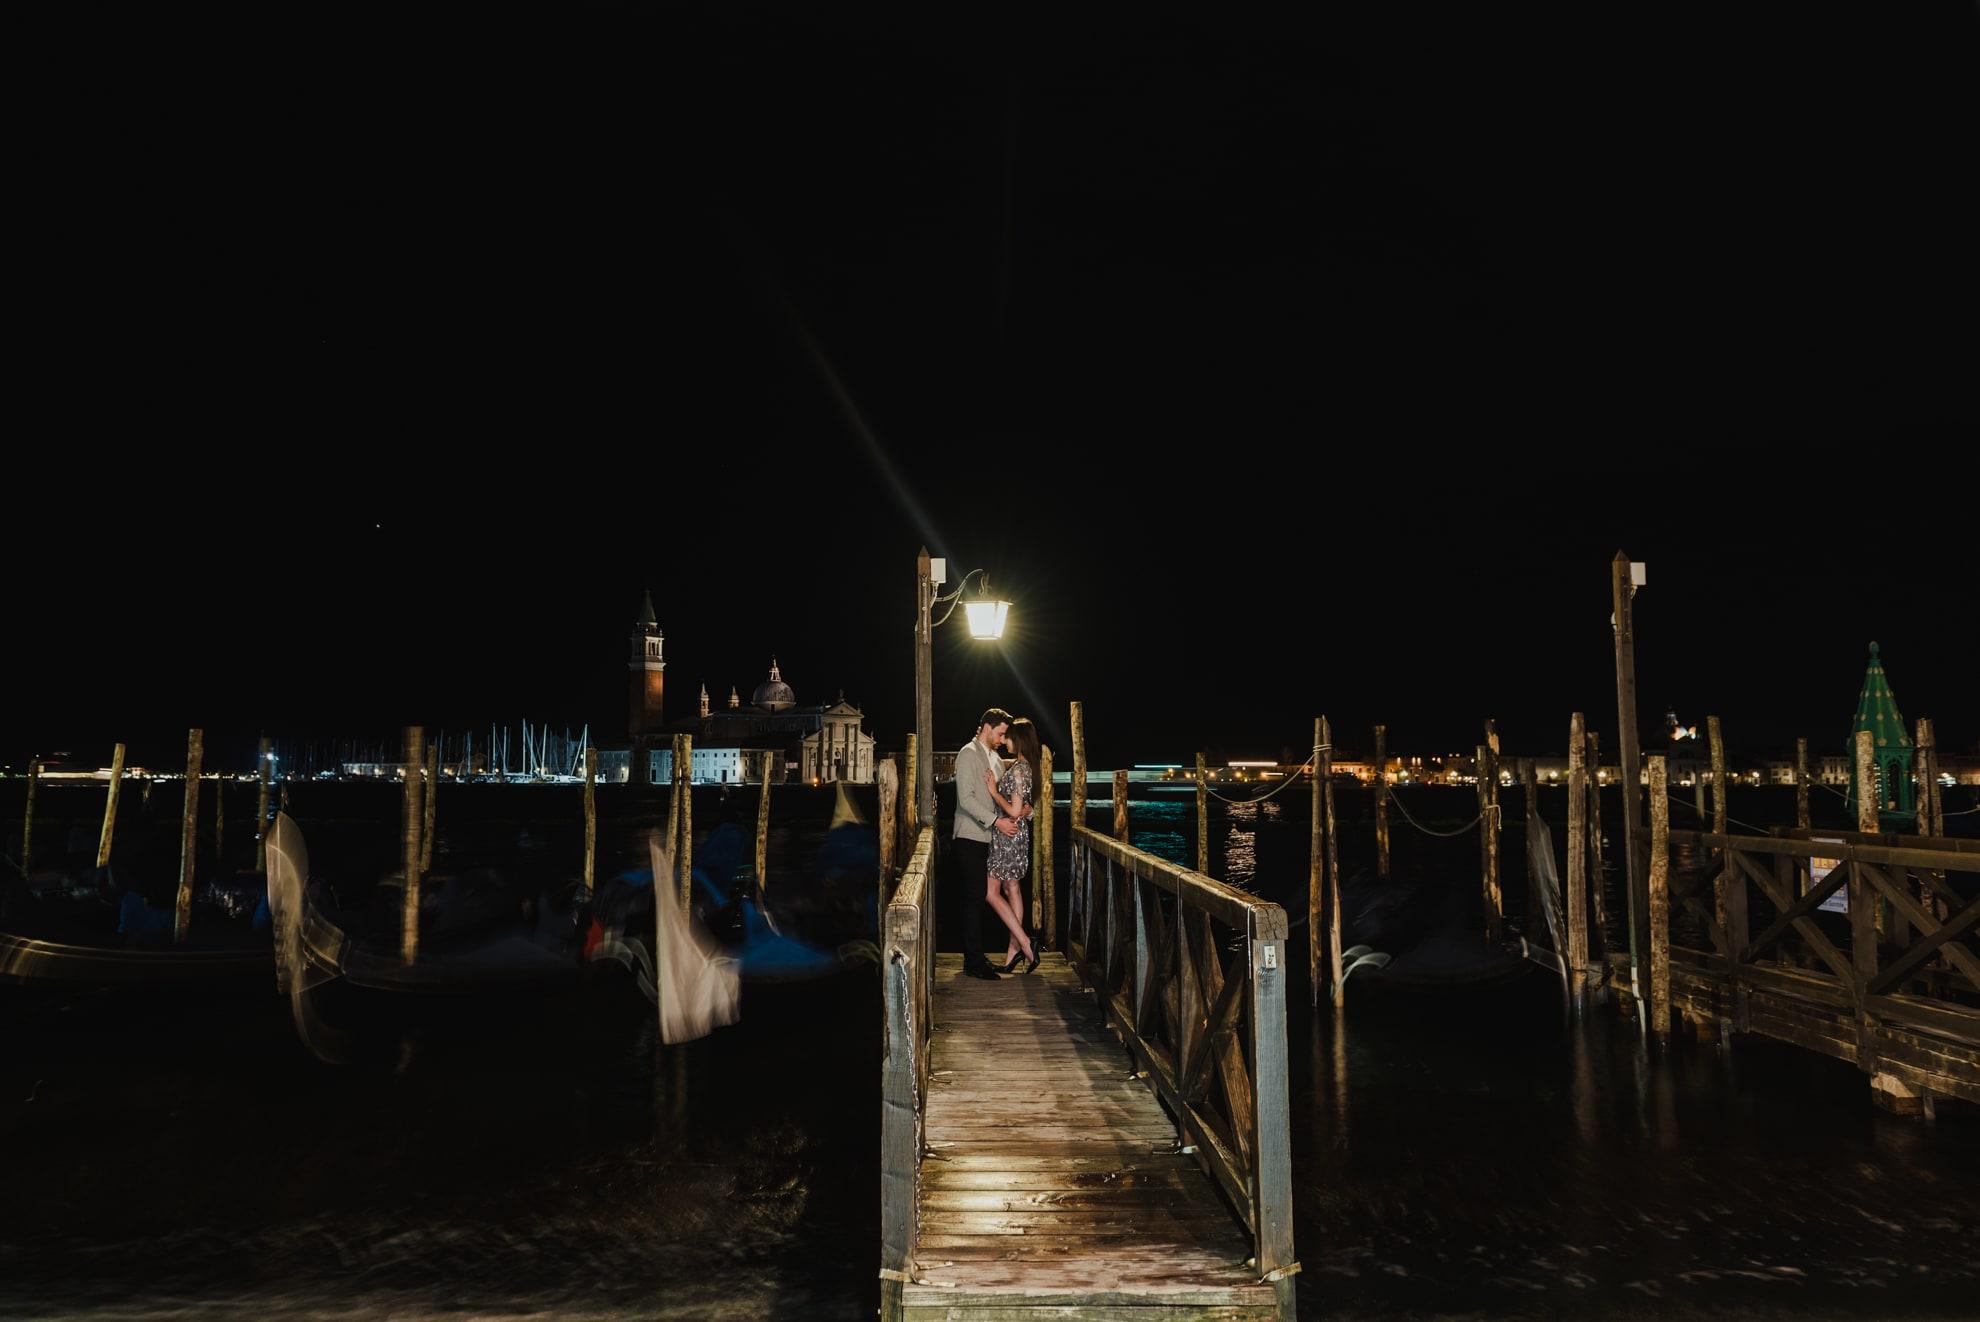 engagement venice venezia proposal proposta matrimonio fidanzamento irene pollacchi fotografa 16